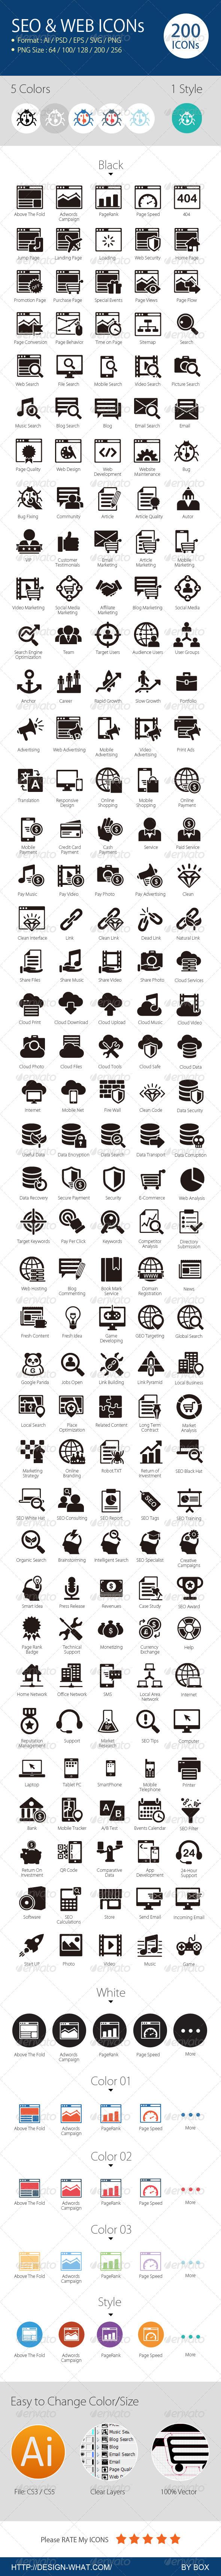 GraphicRiver SEO & Web Icons 6351976